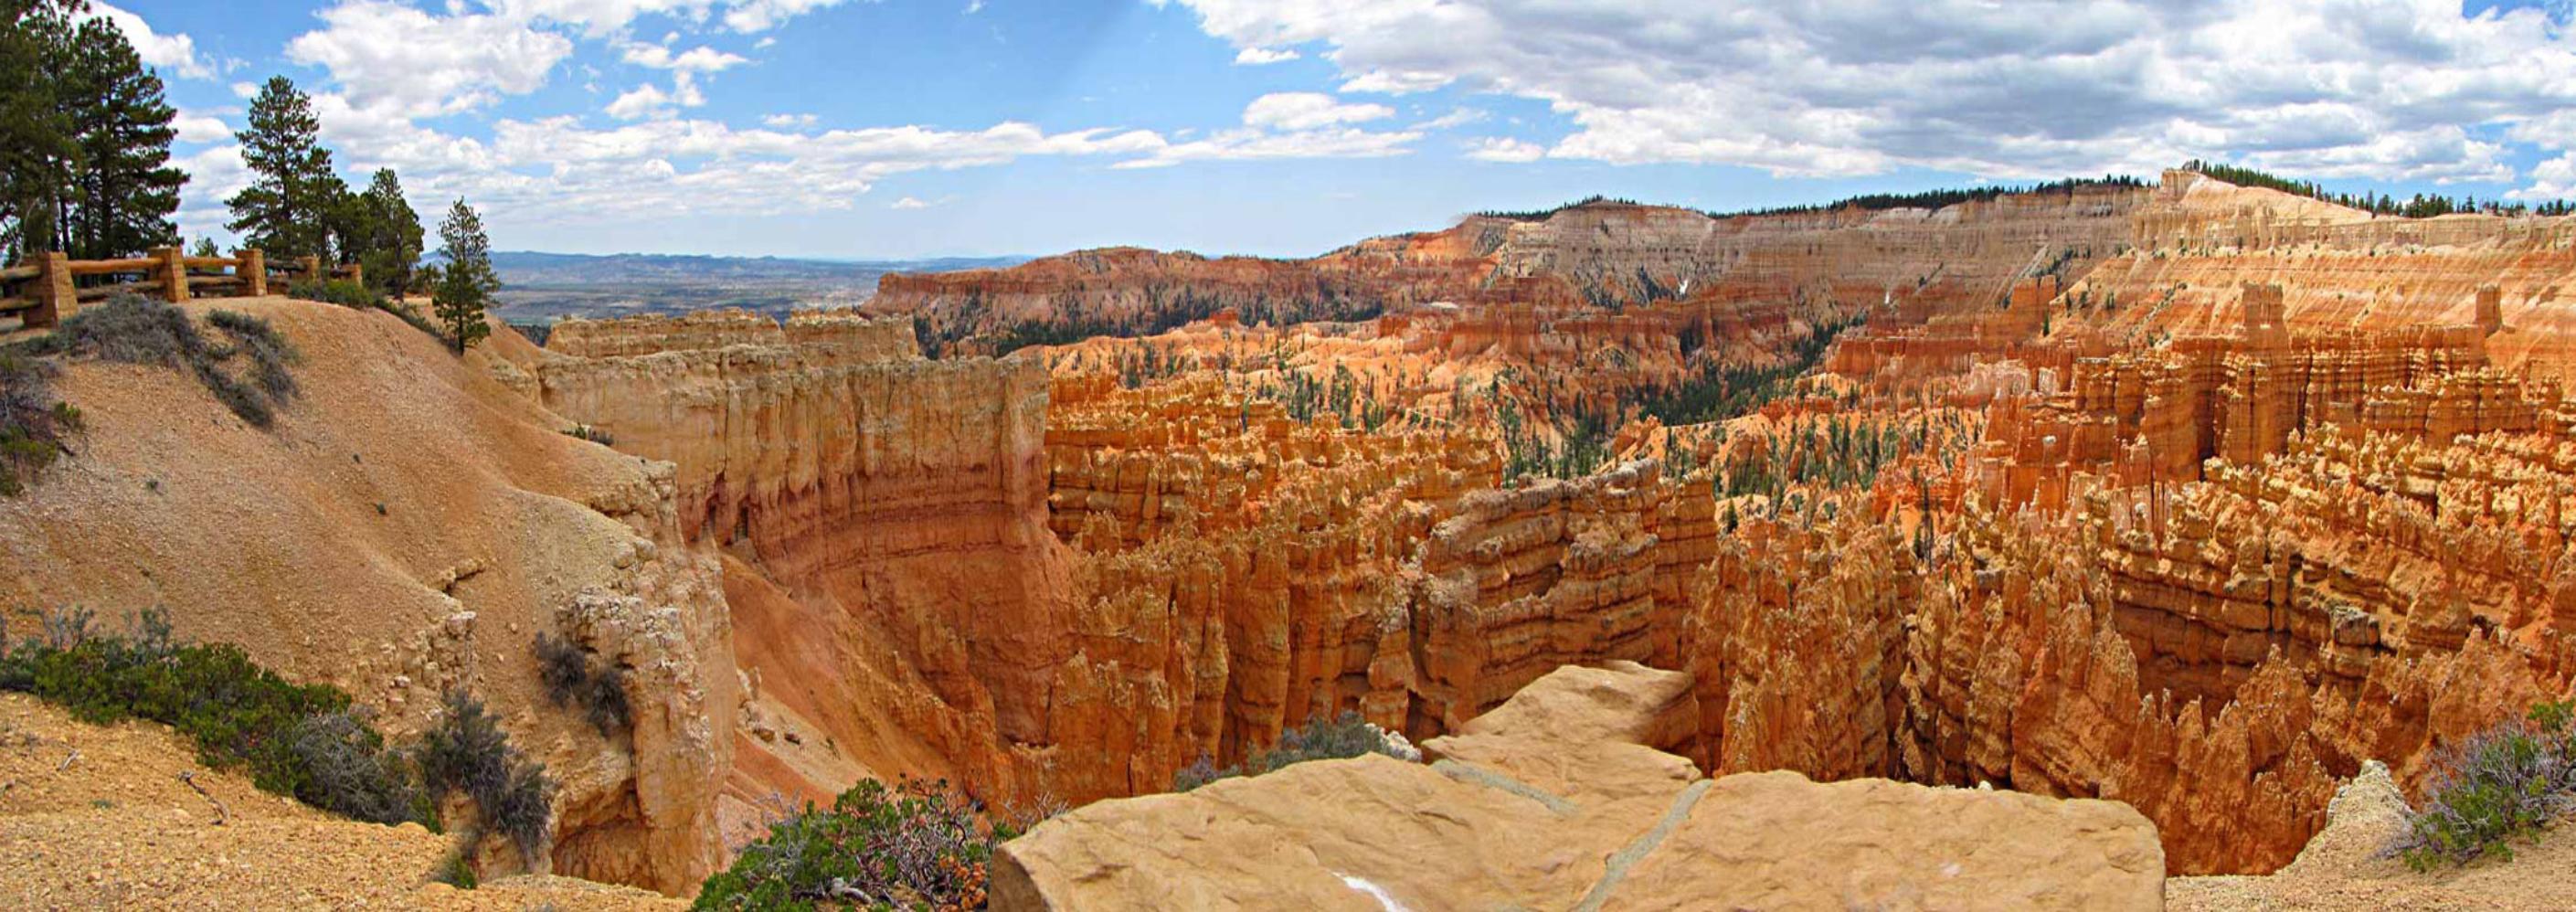 Bryce Canyon National Park In Utah Panoramic Views